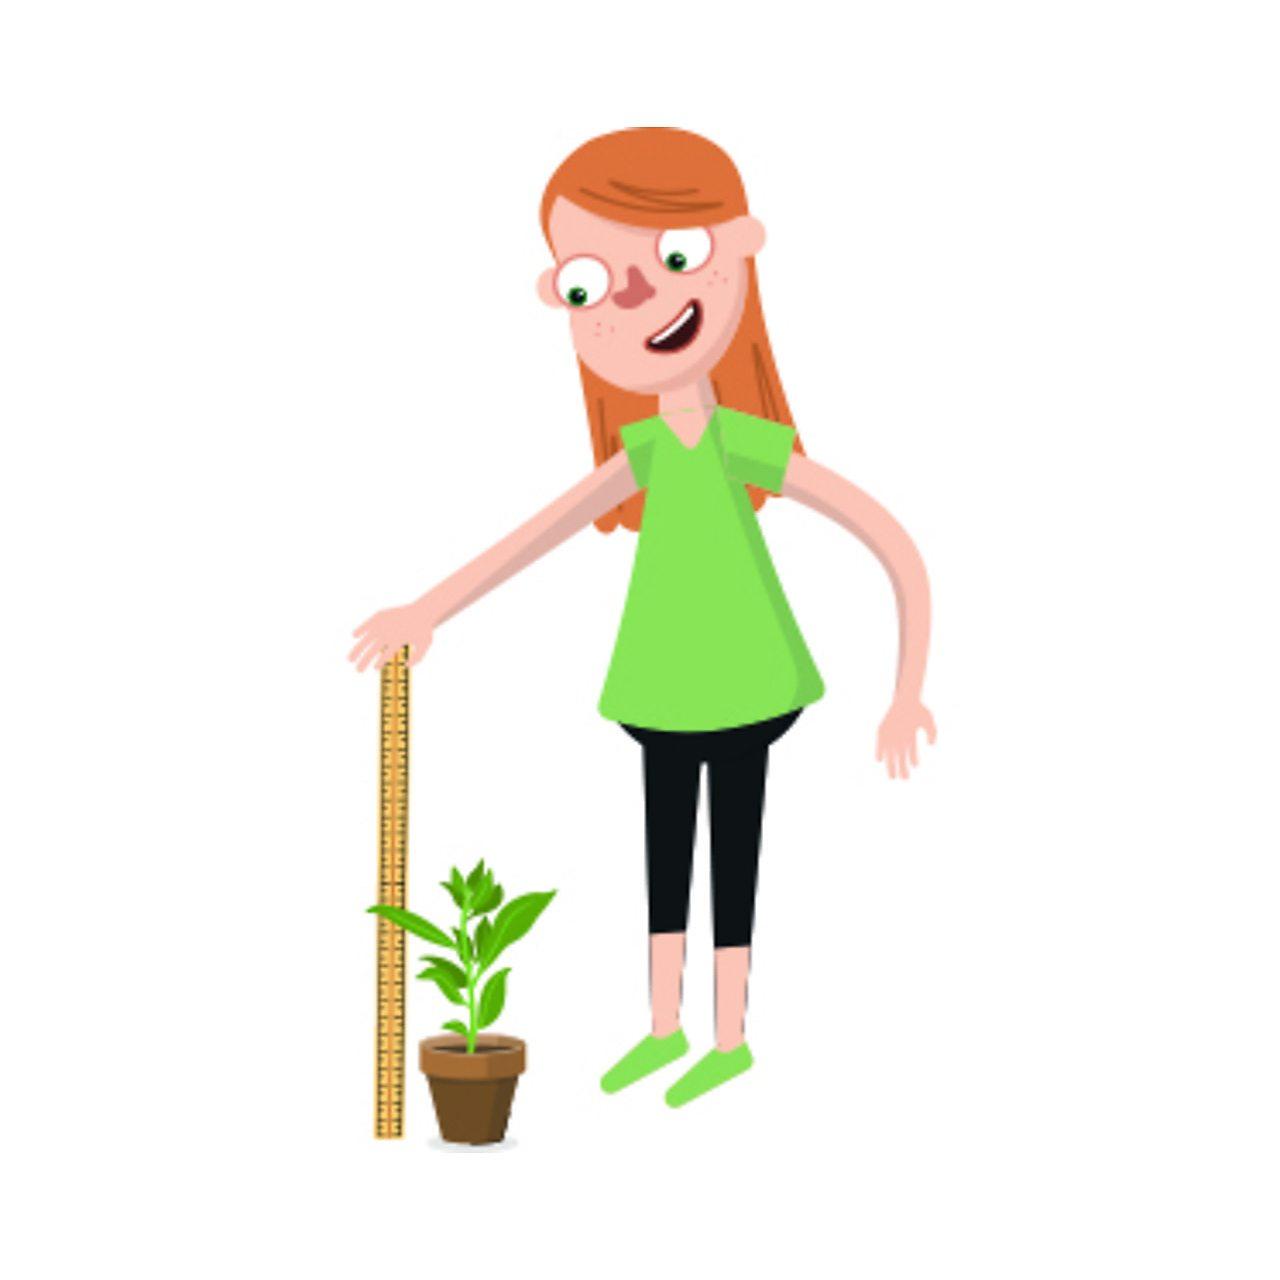 Grow Investigation - Classroom presentation